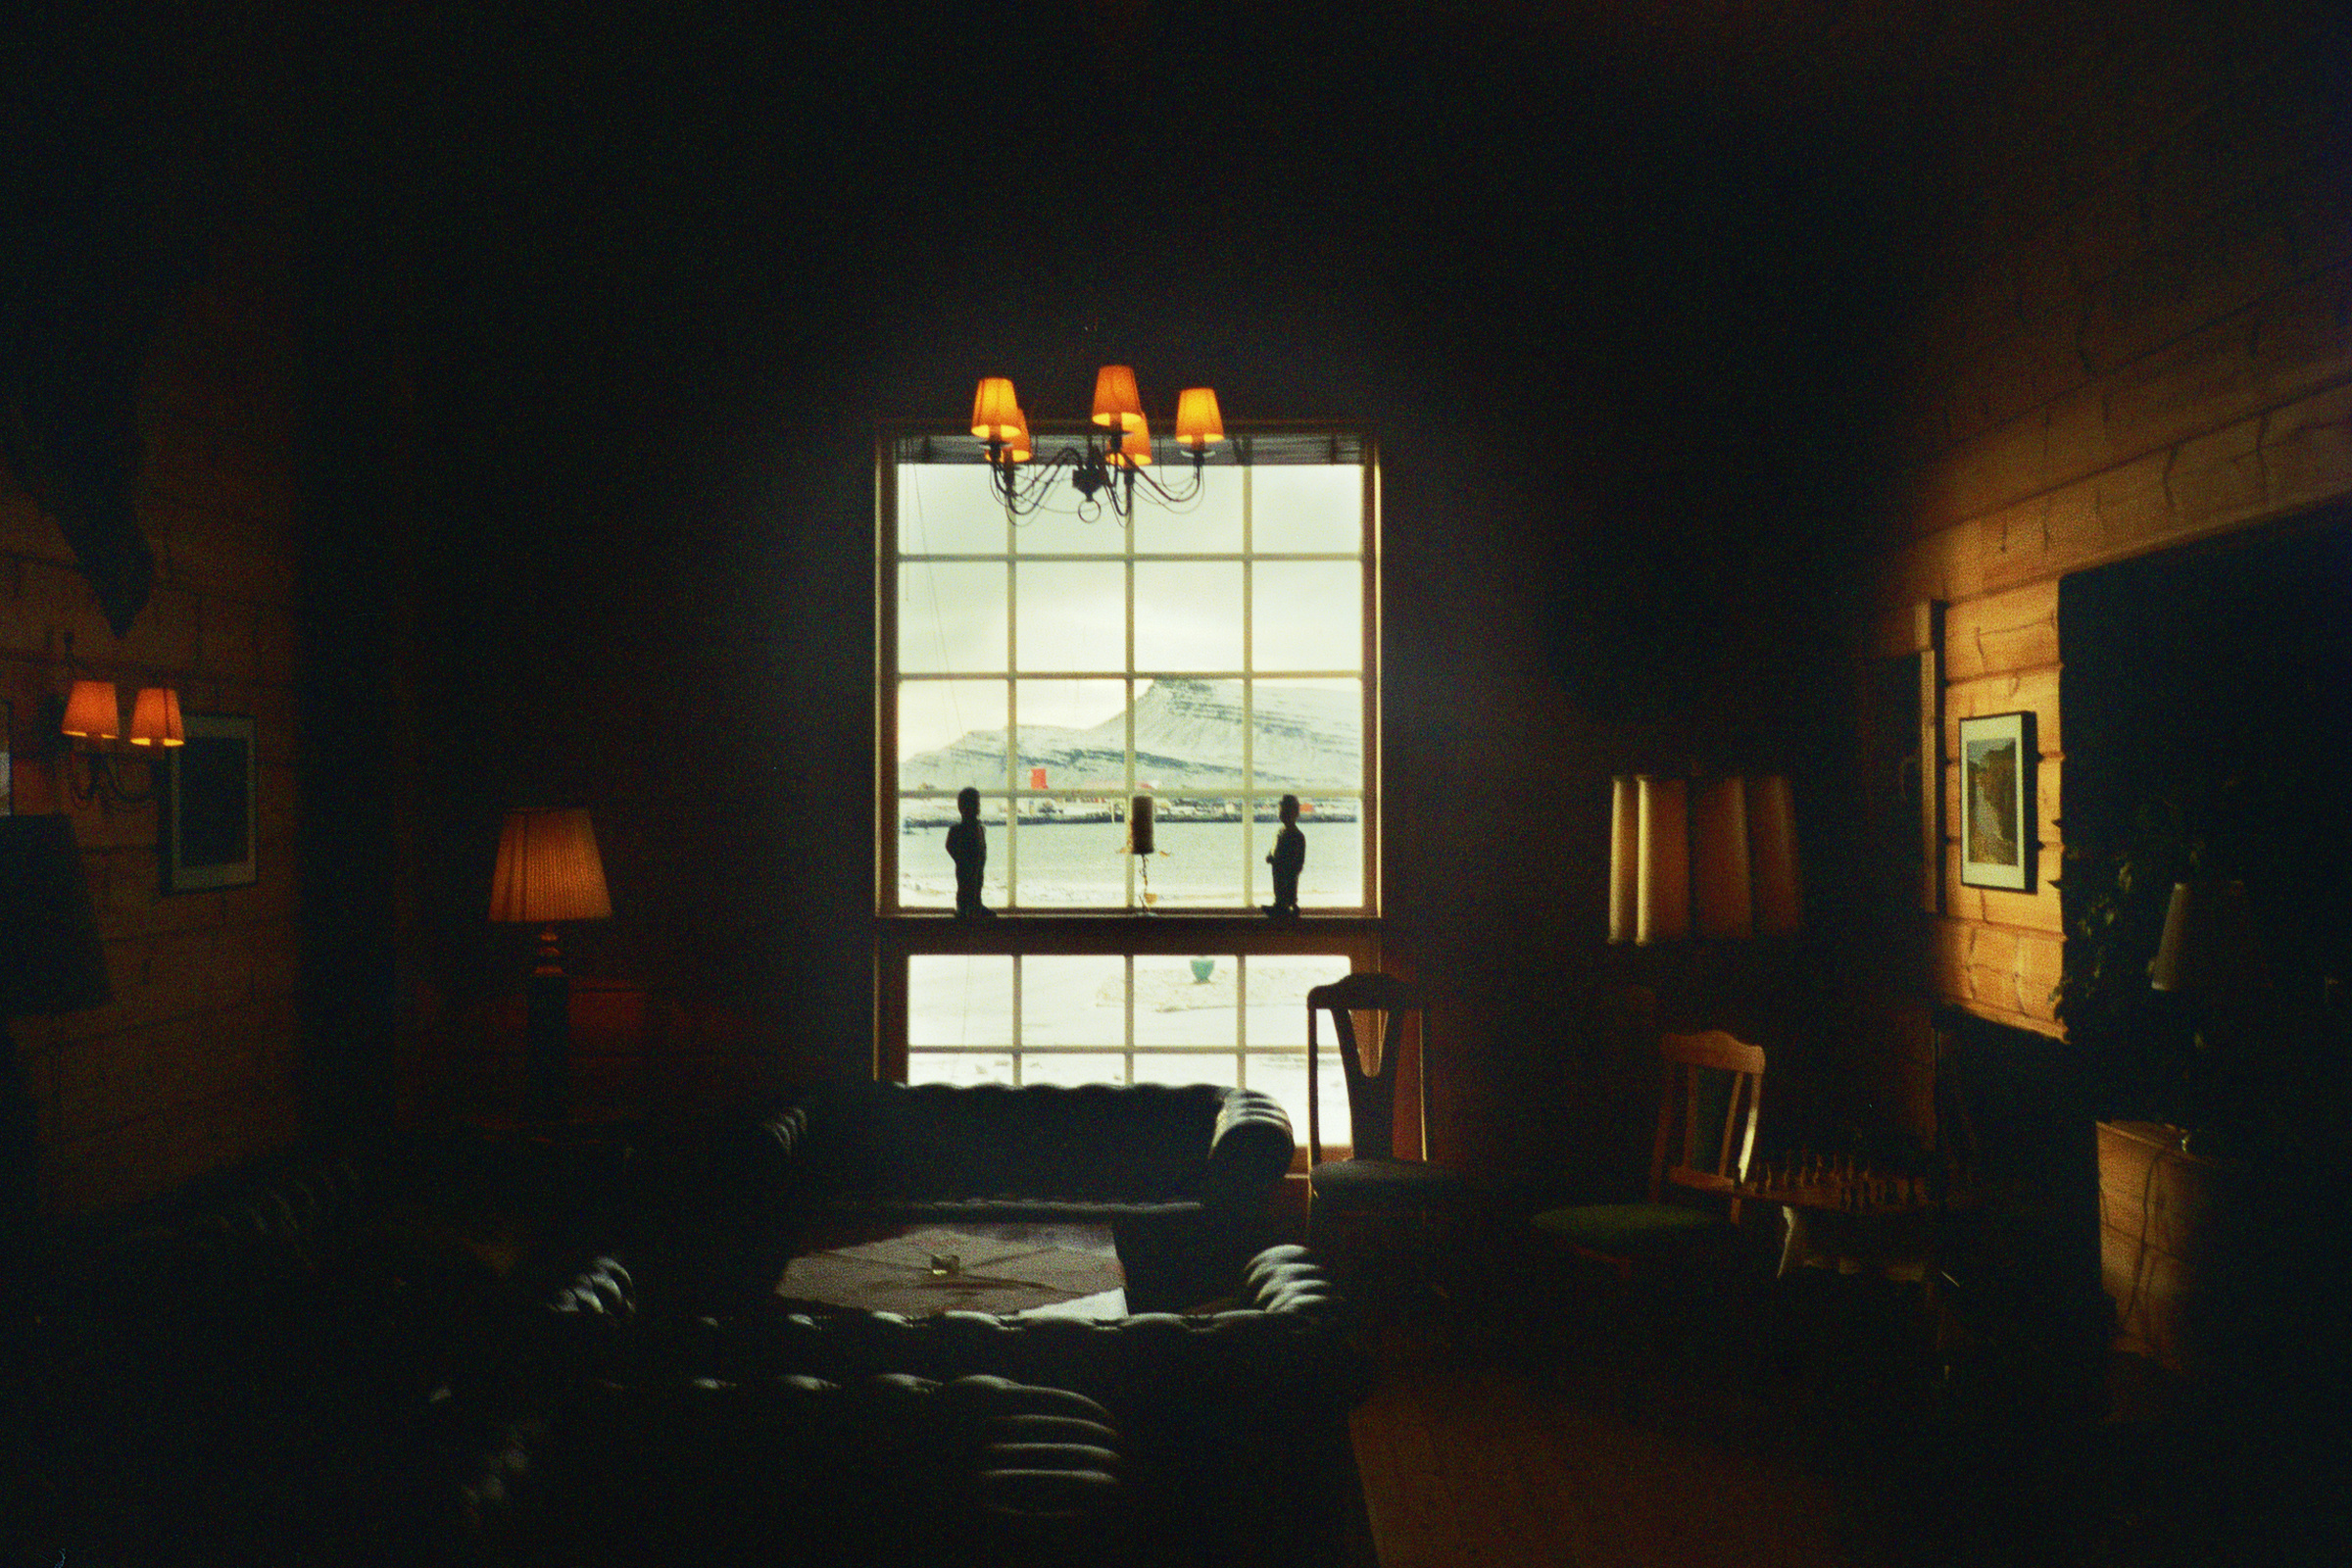 hotel room 2 - iceland